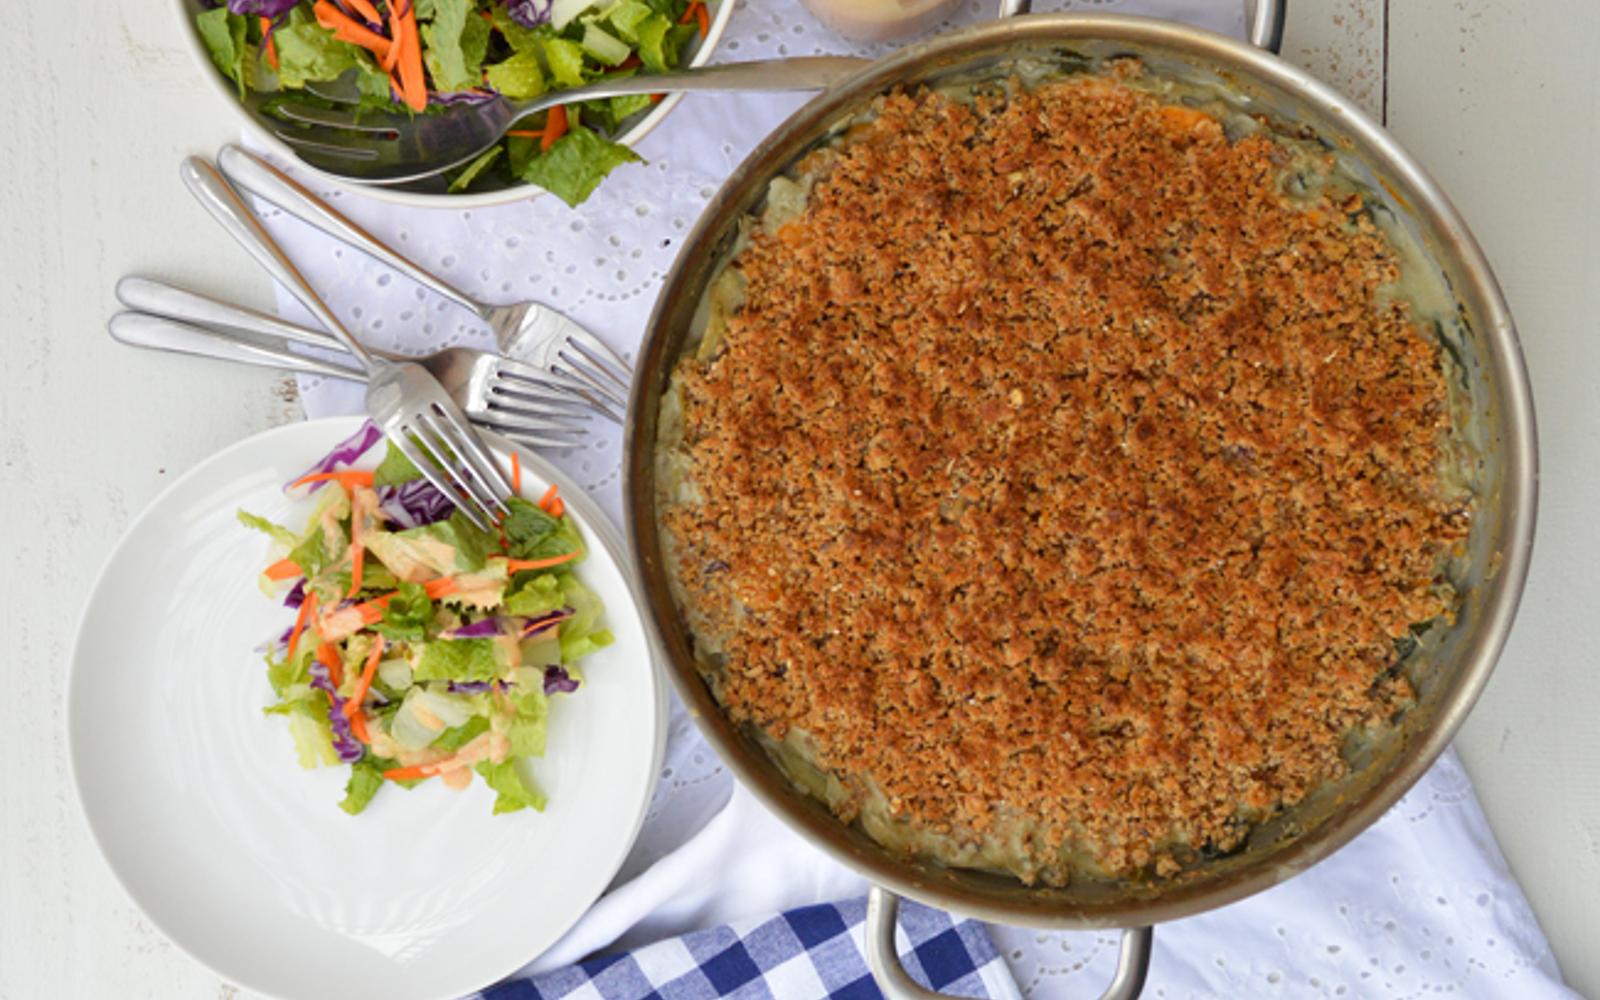 vegetable au gratin casserole